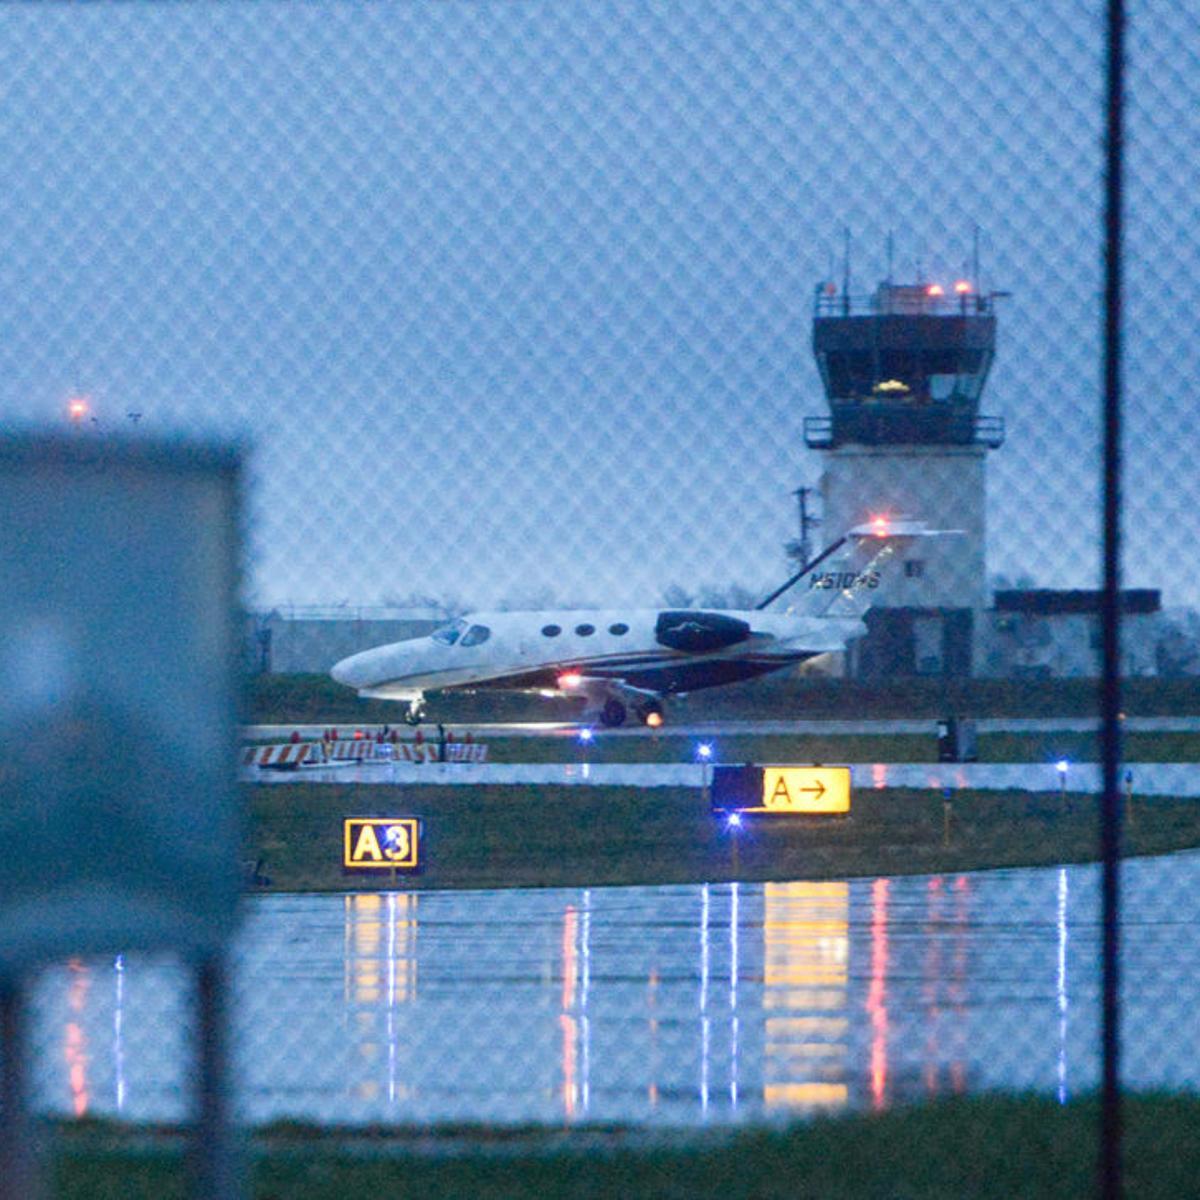 Flight delays plague an increasingly popular Columbia Regional Airport    Local   columbiamissourian.com